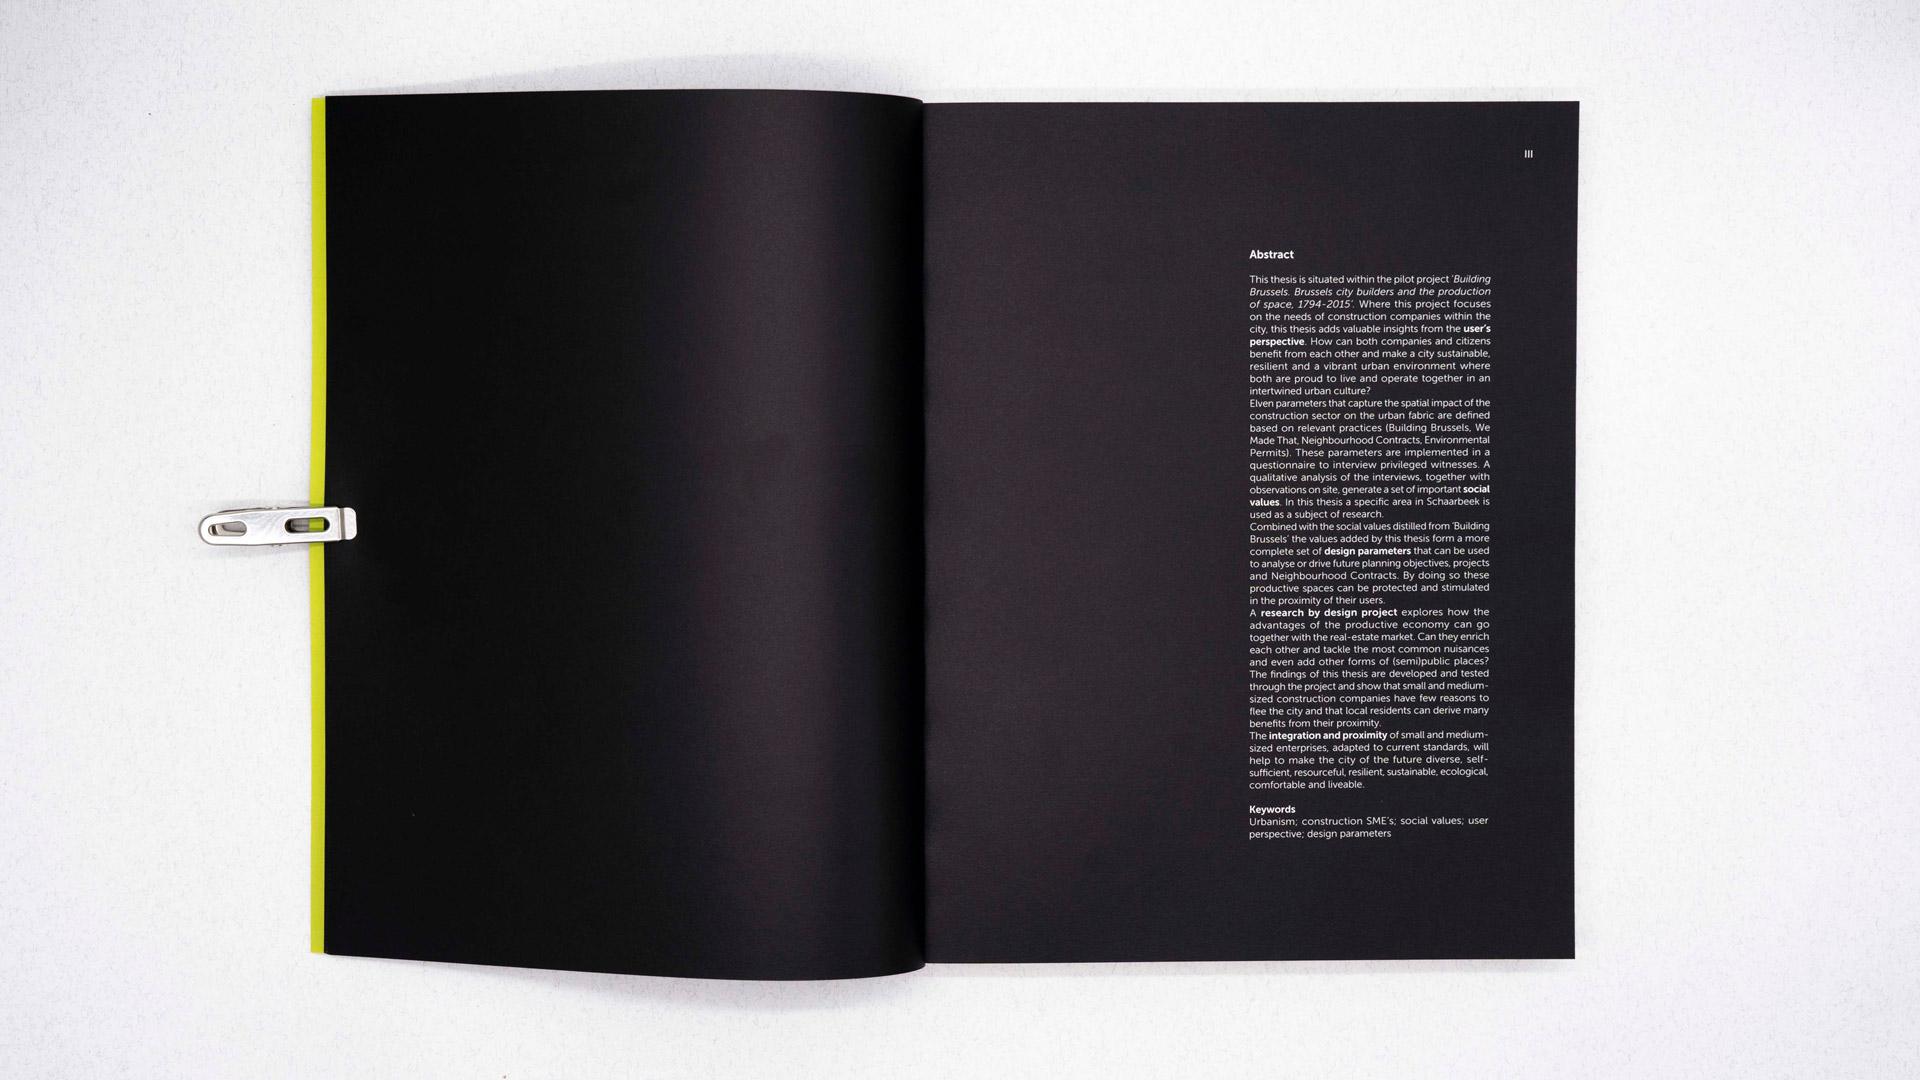 schaarbeek_speak_photo7_printed_book